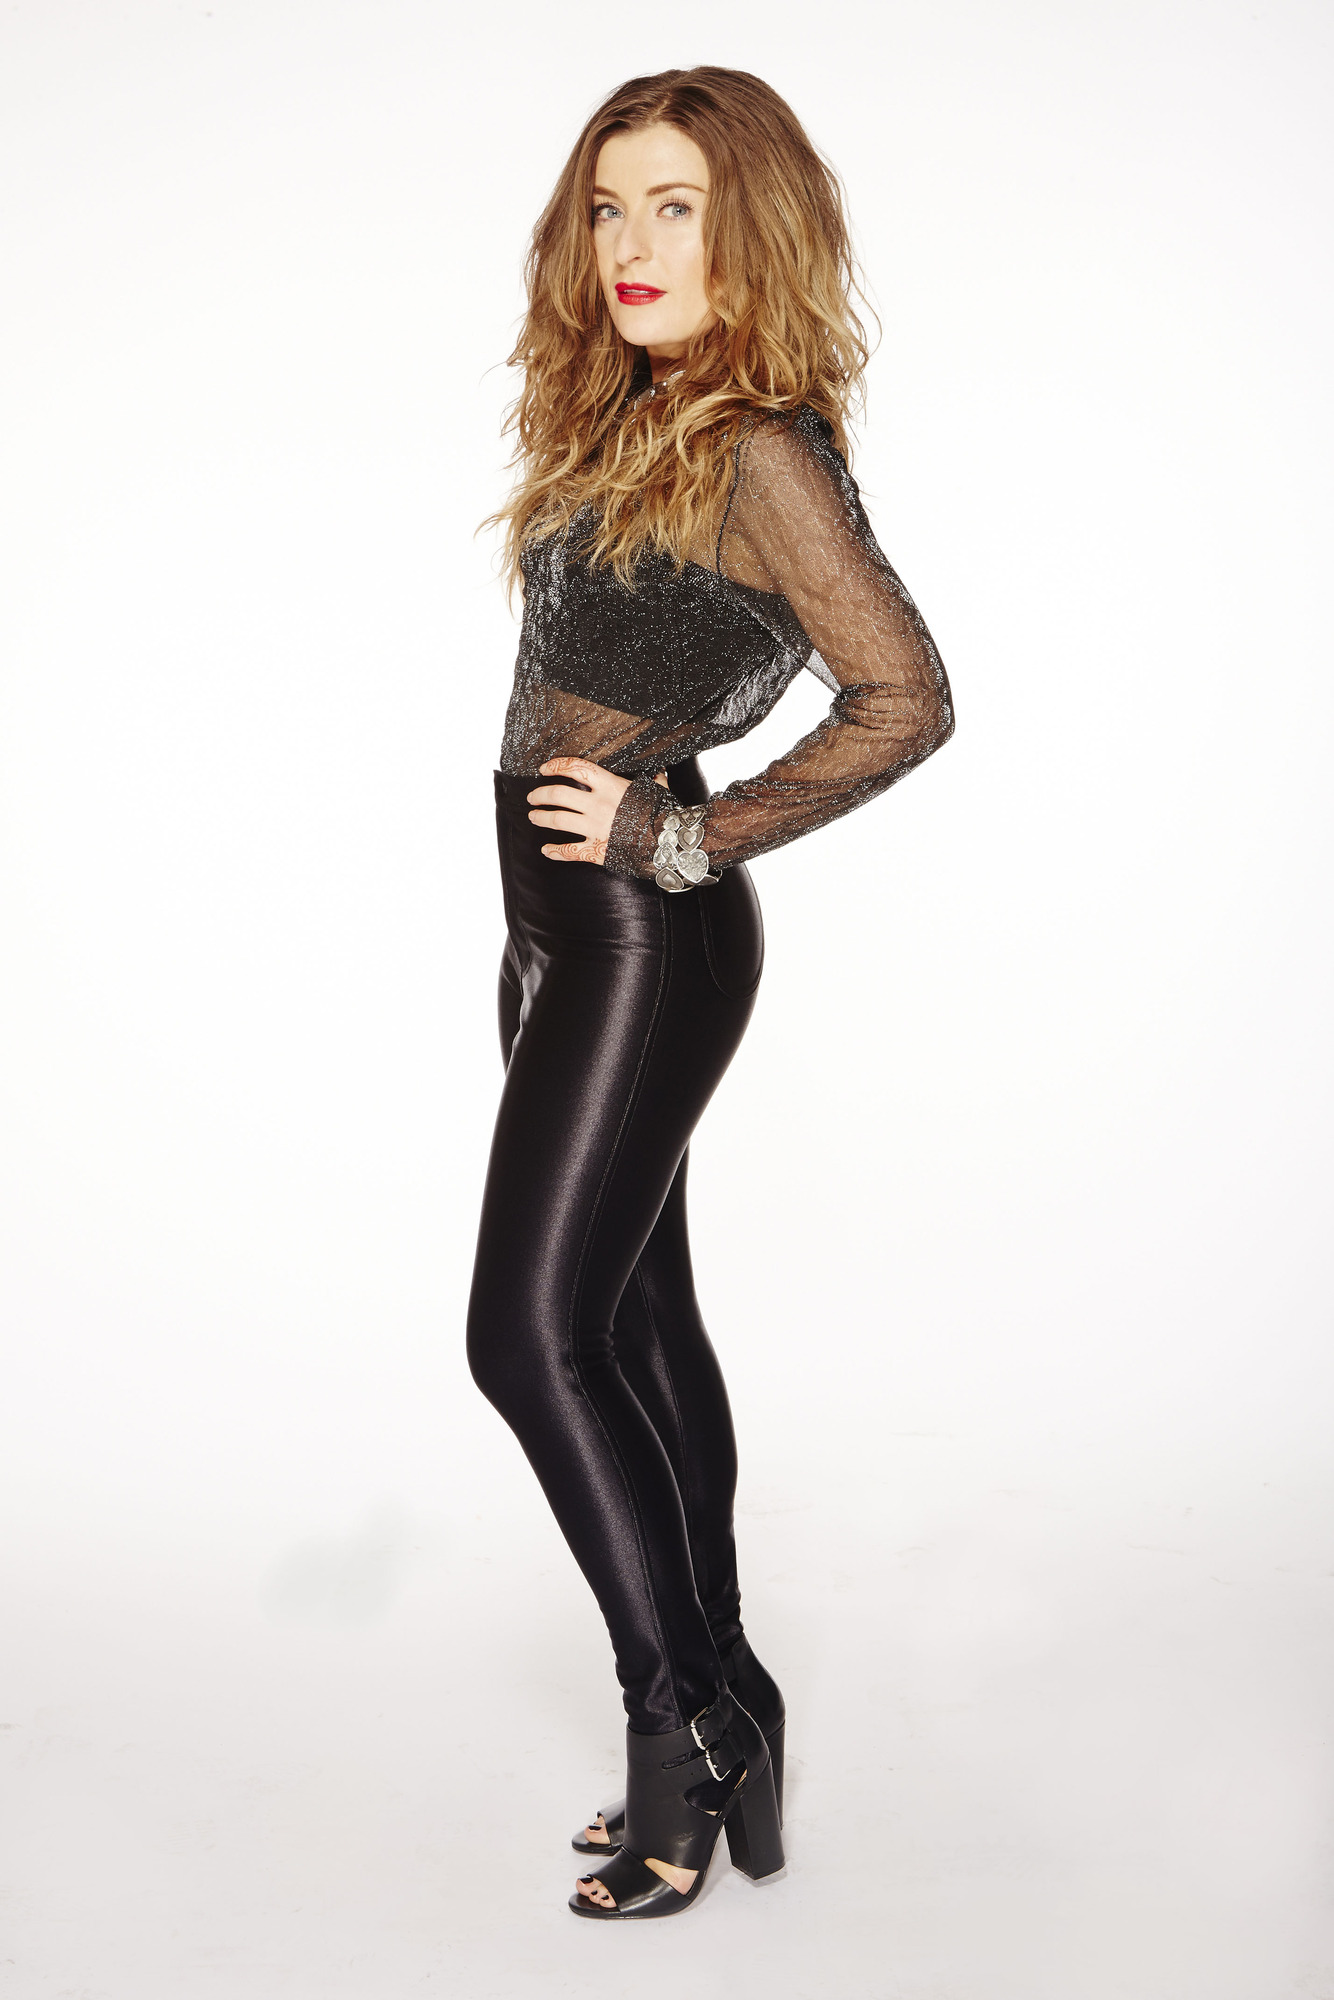 Eurovision 2014: Molly Smitten-Downes